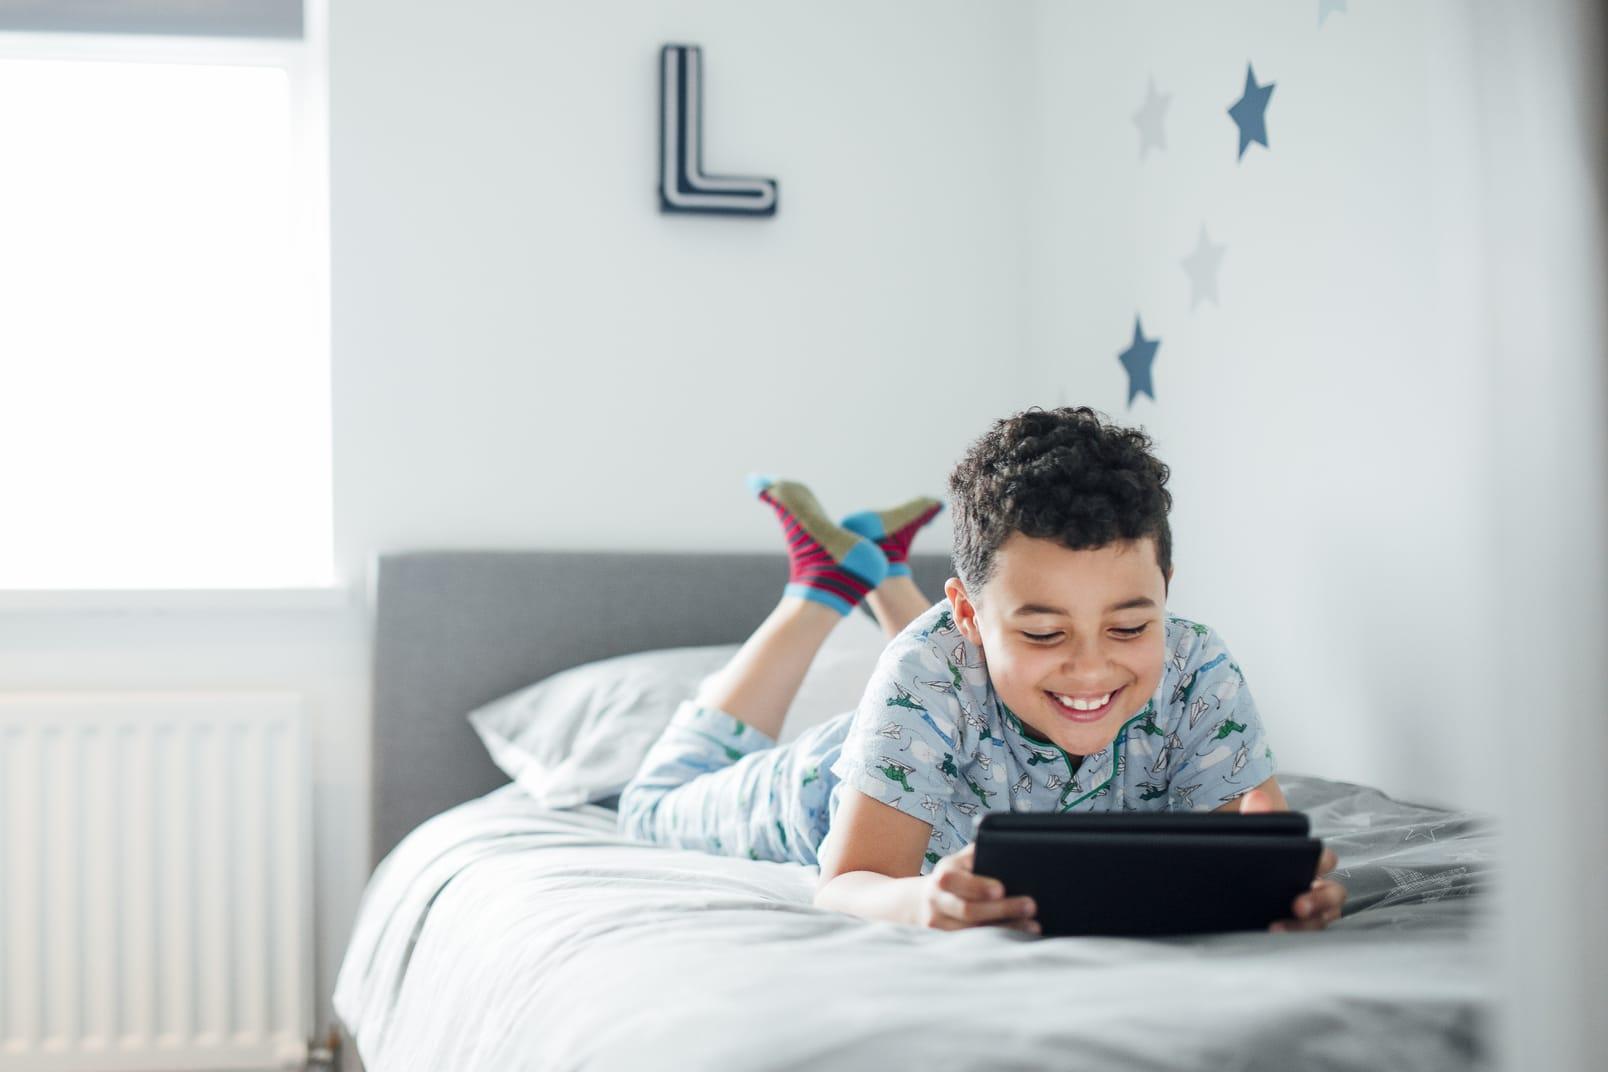 Boy Using Digital Tablet in the Morning